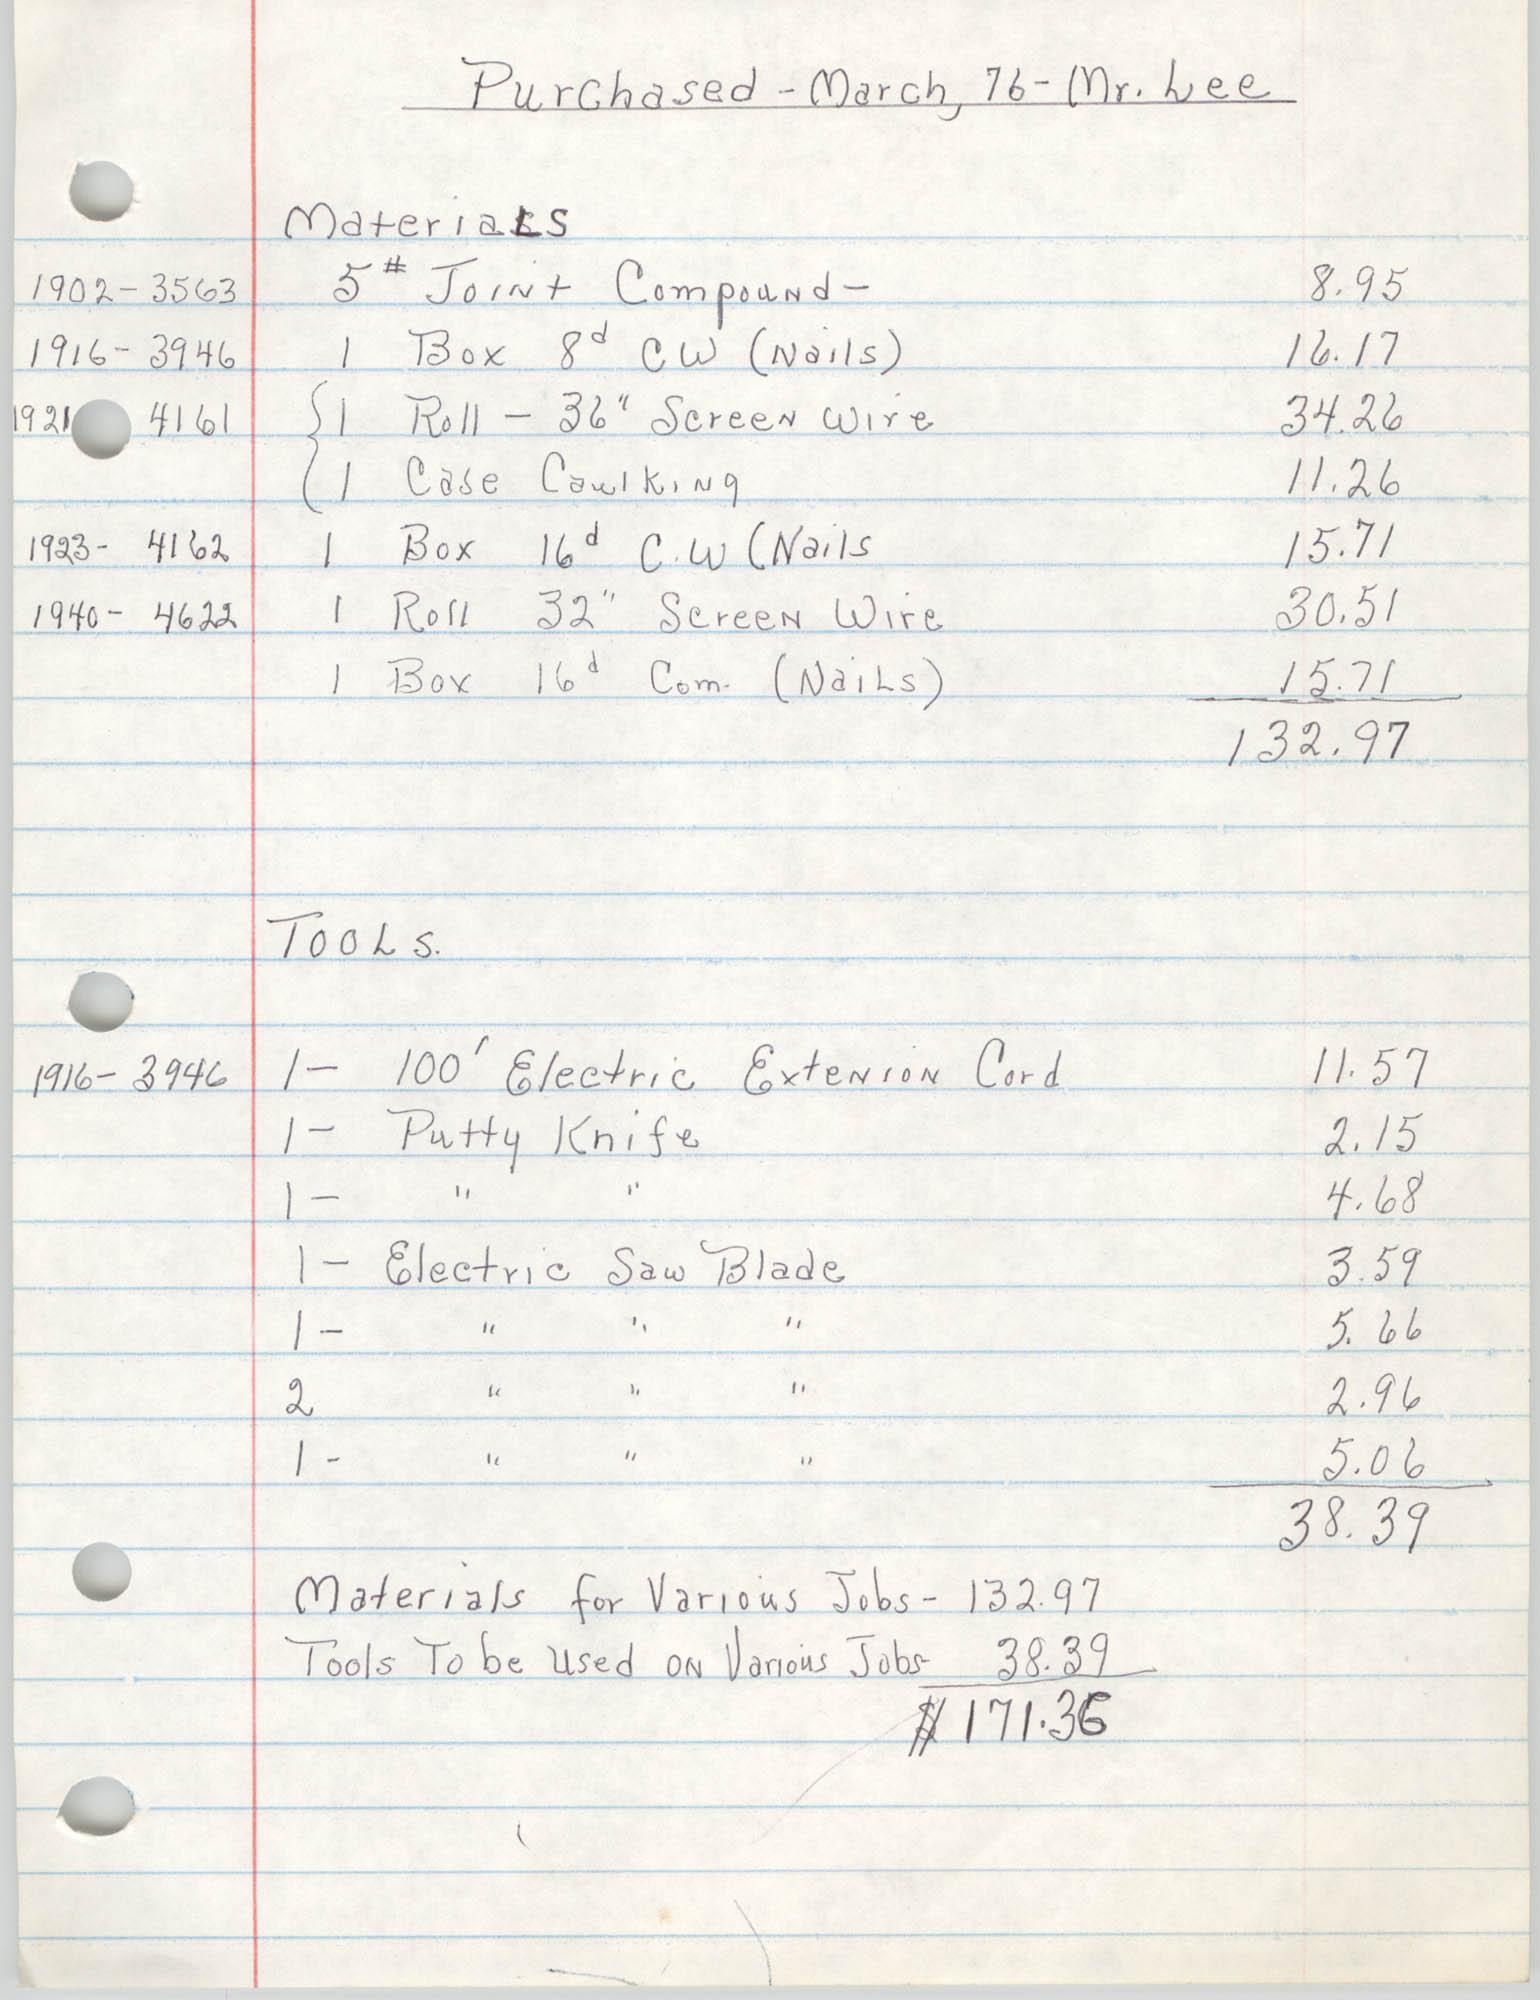 COBRA Chore Services, March 1976, Materials and Tools